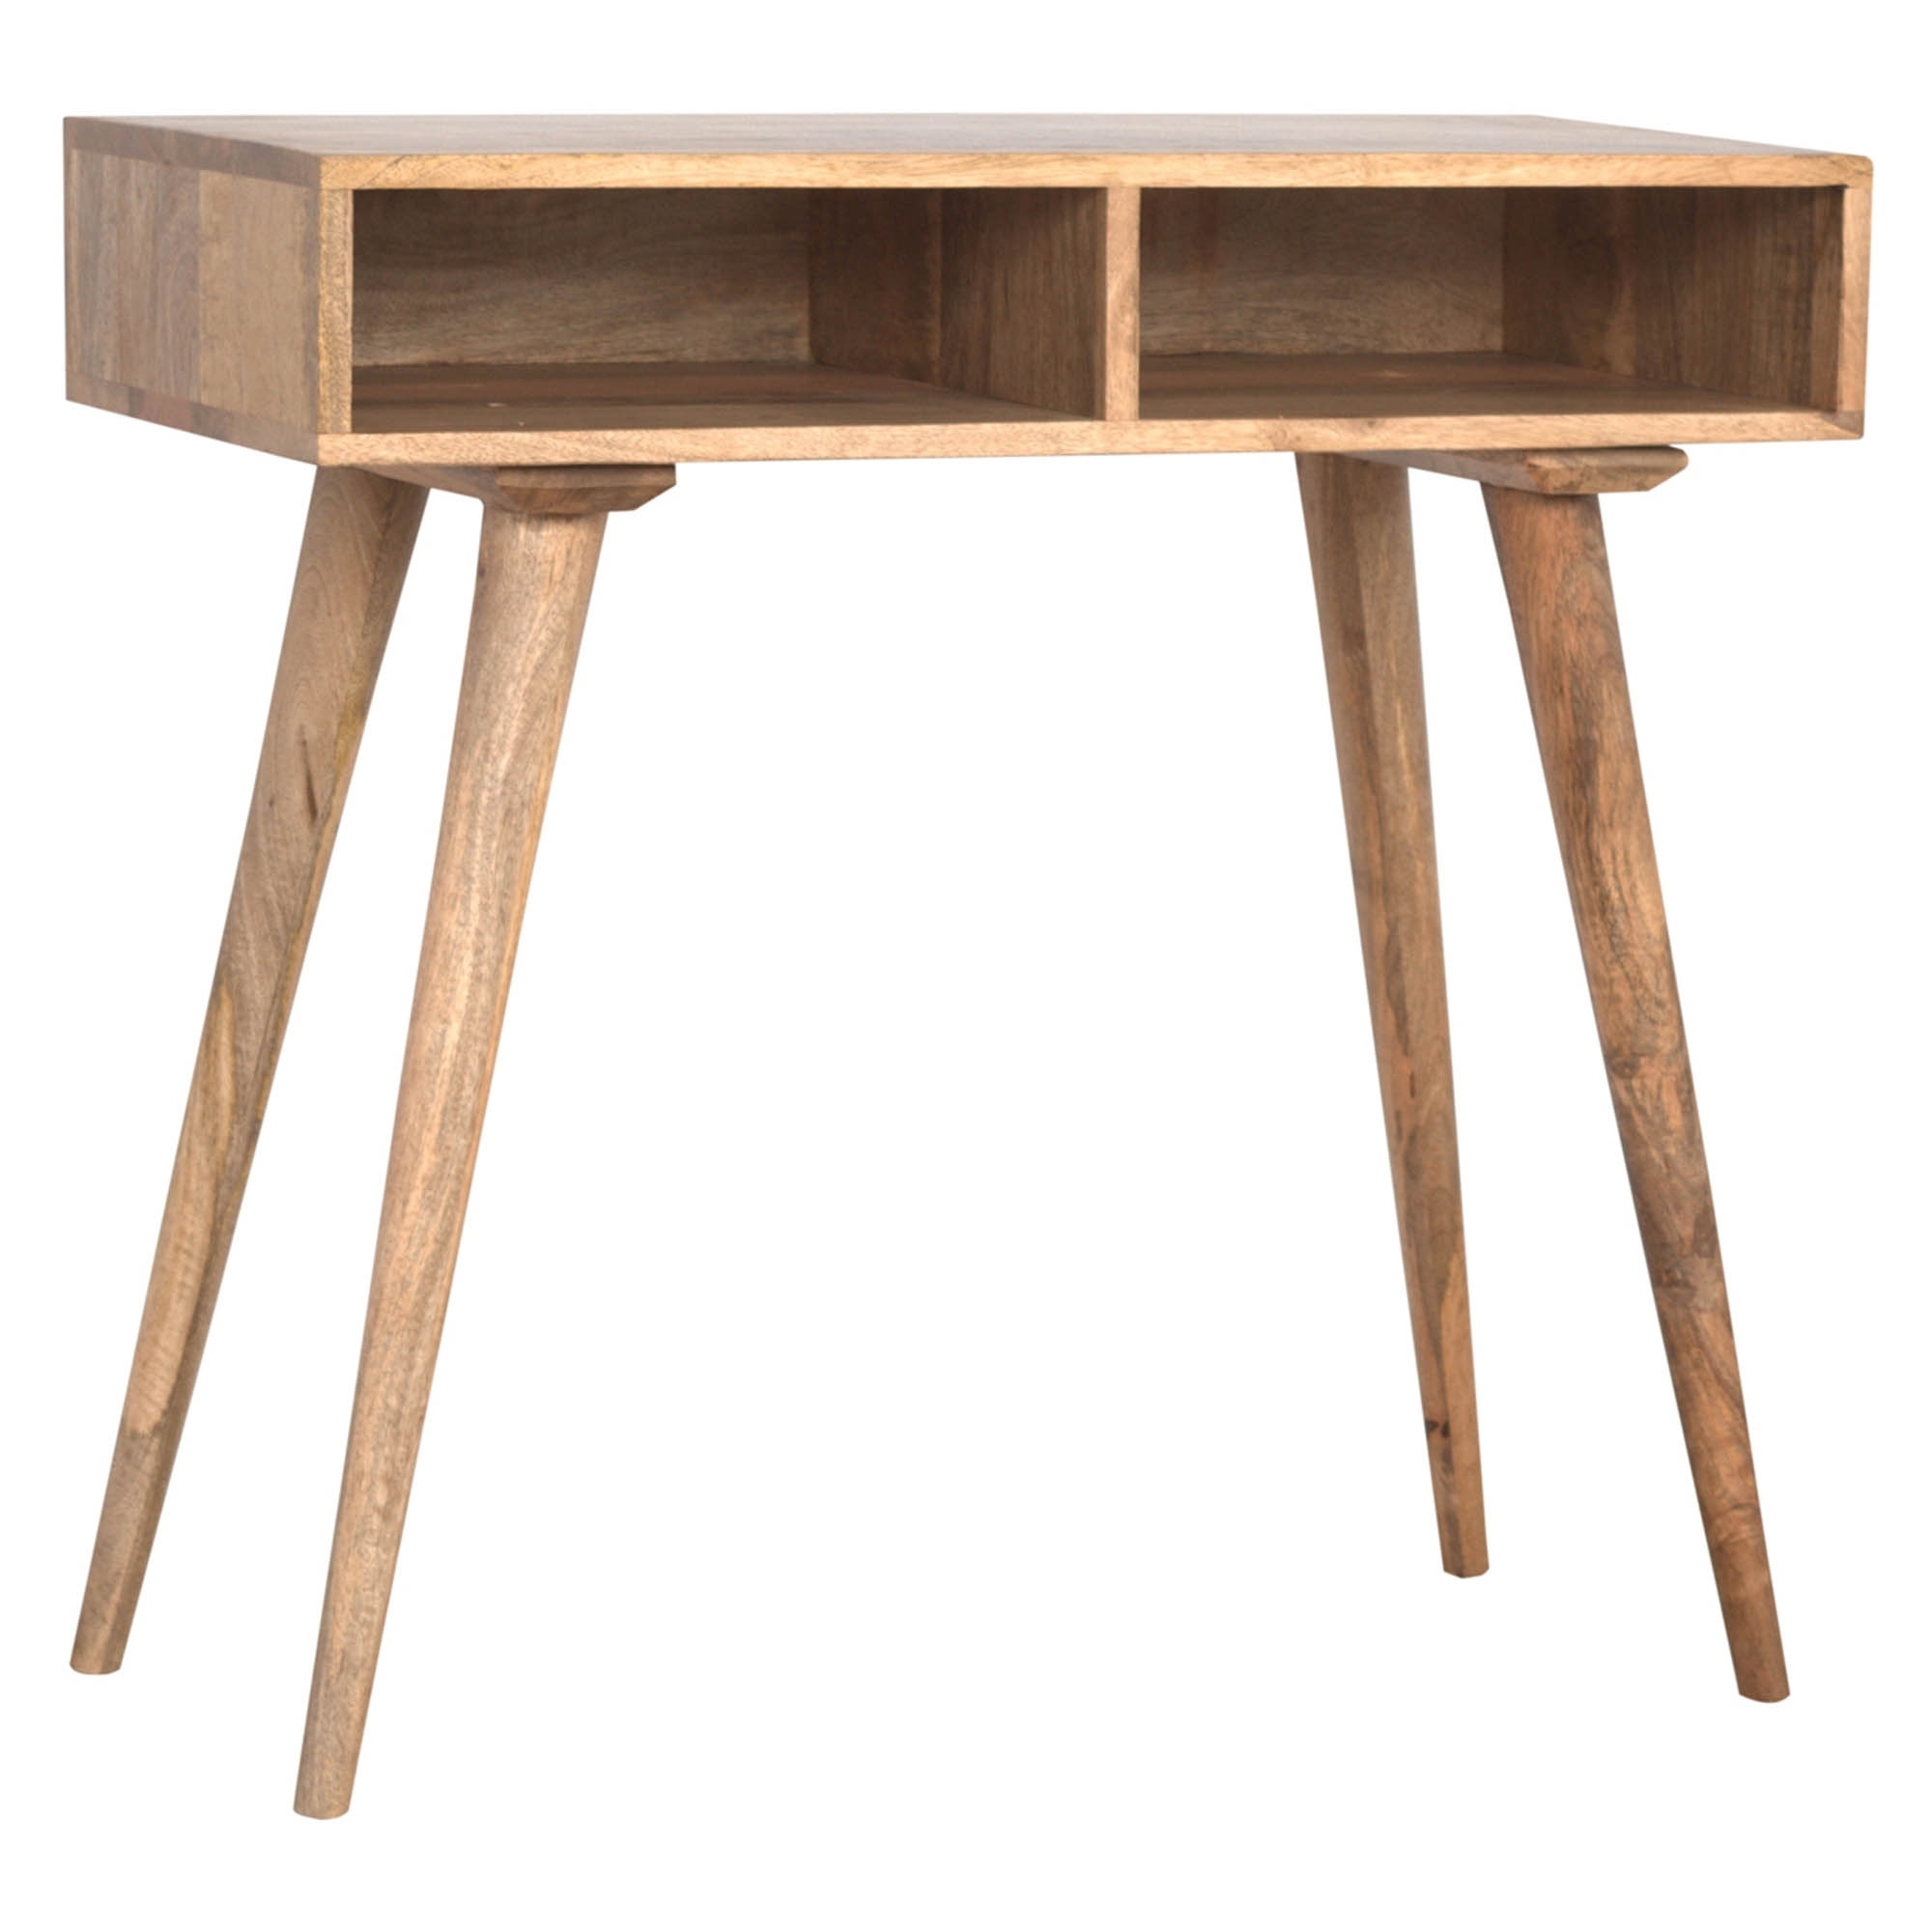 Peachy Handmade Mango 2 Open Shelf Console Table Pabps2019 Chair Design Images Pabps2019Com